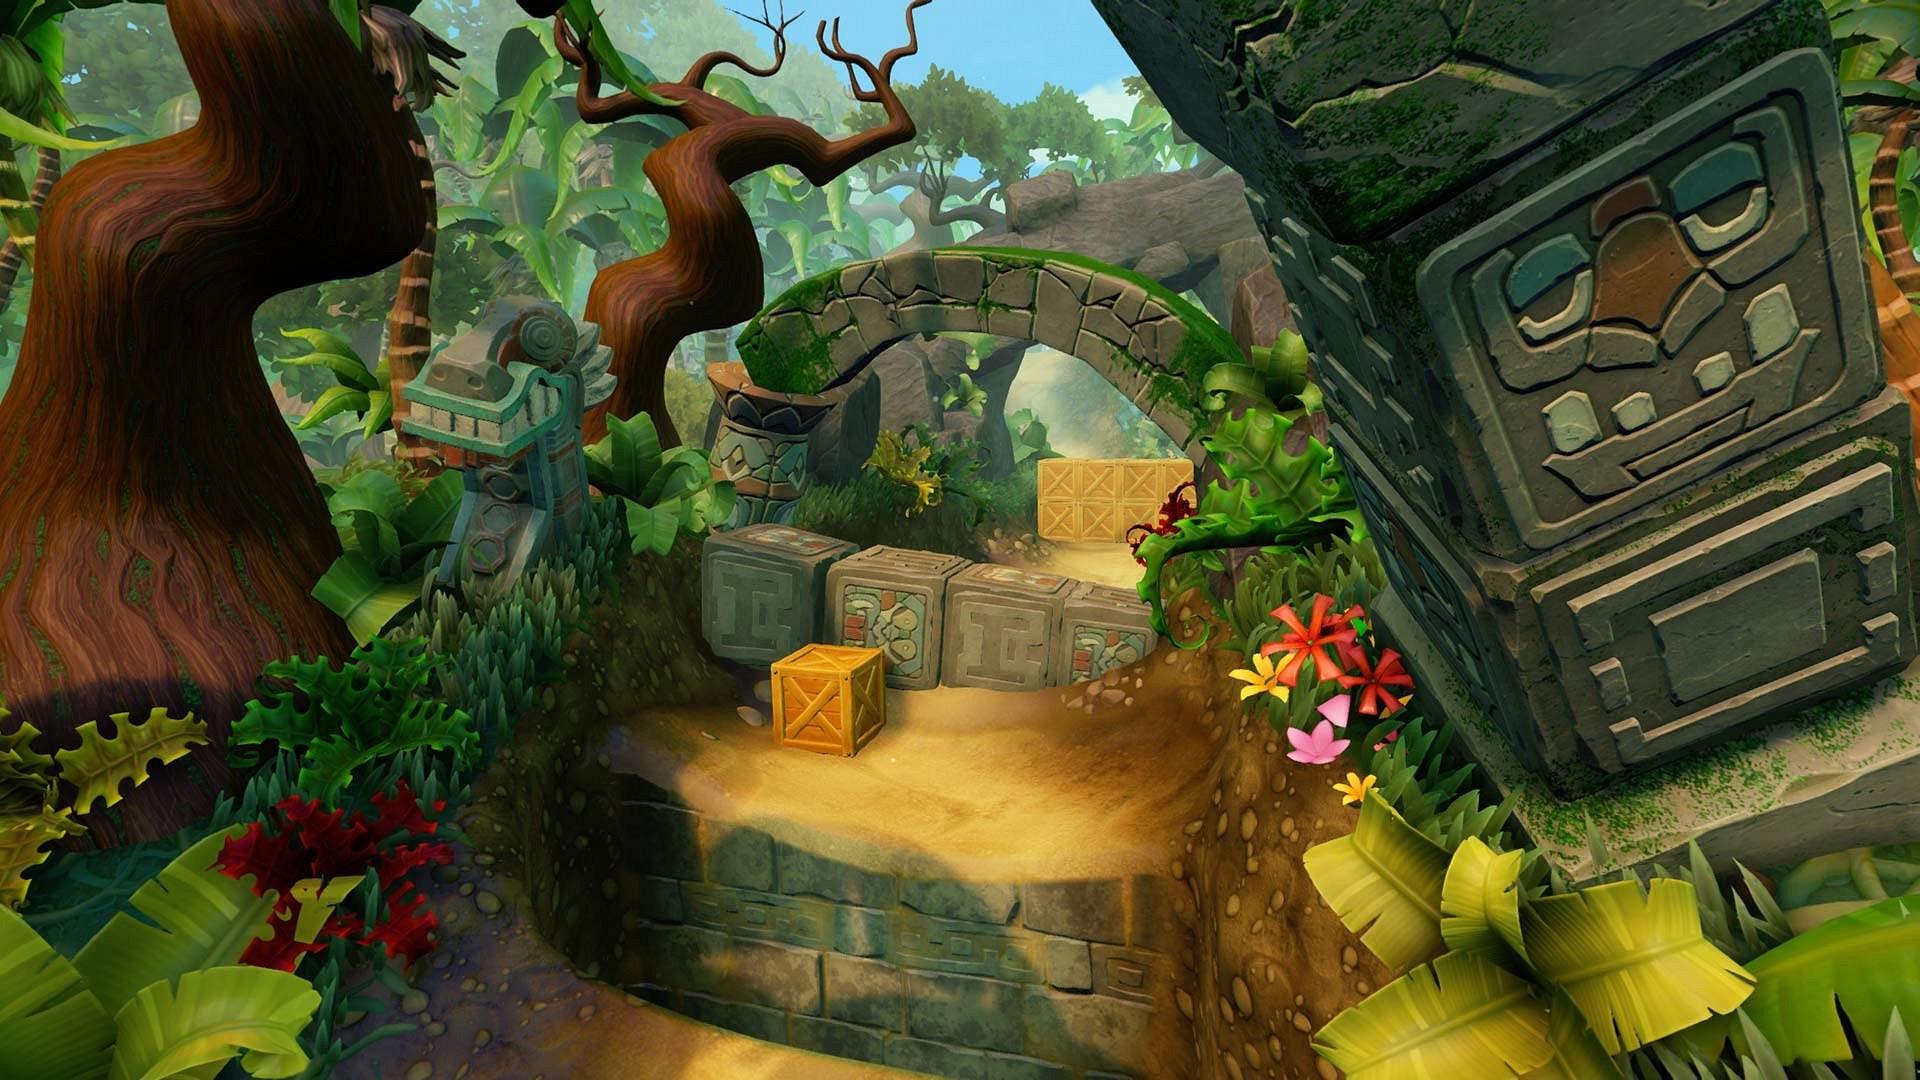 Crash Bandicoot Wallpapers Wallpapertag